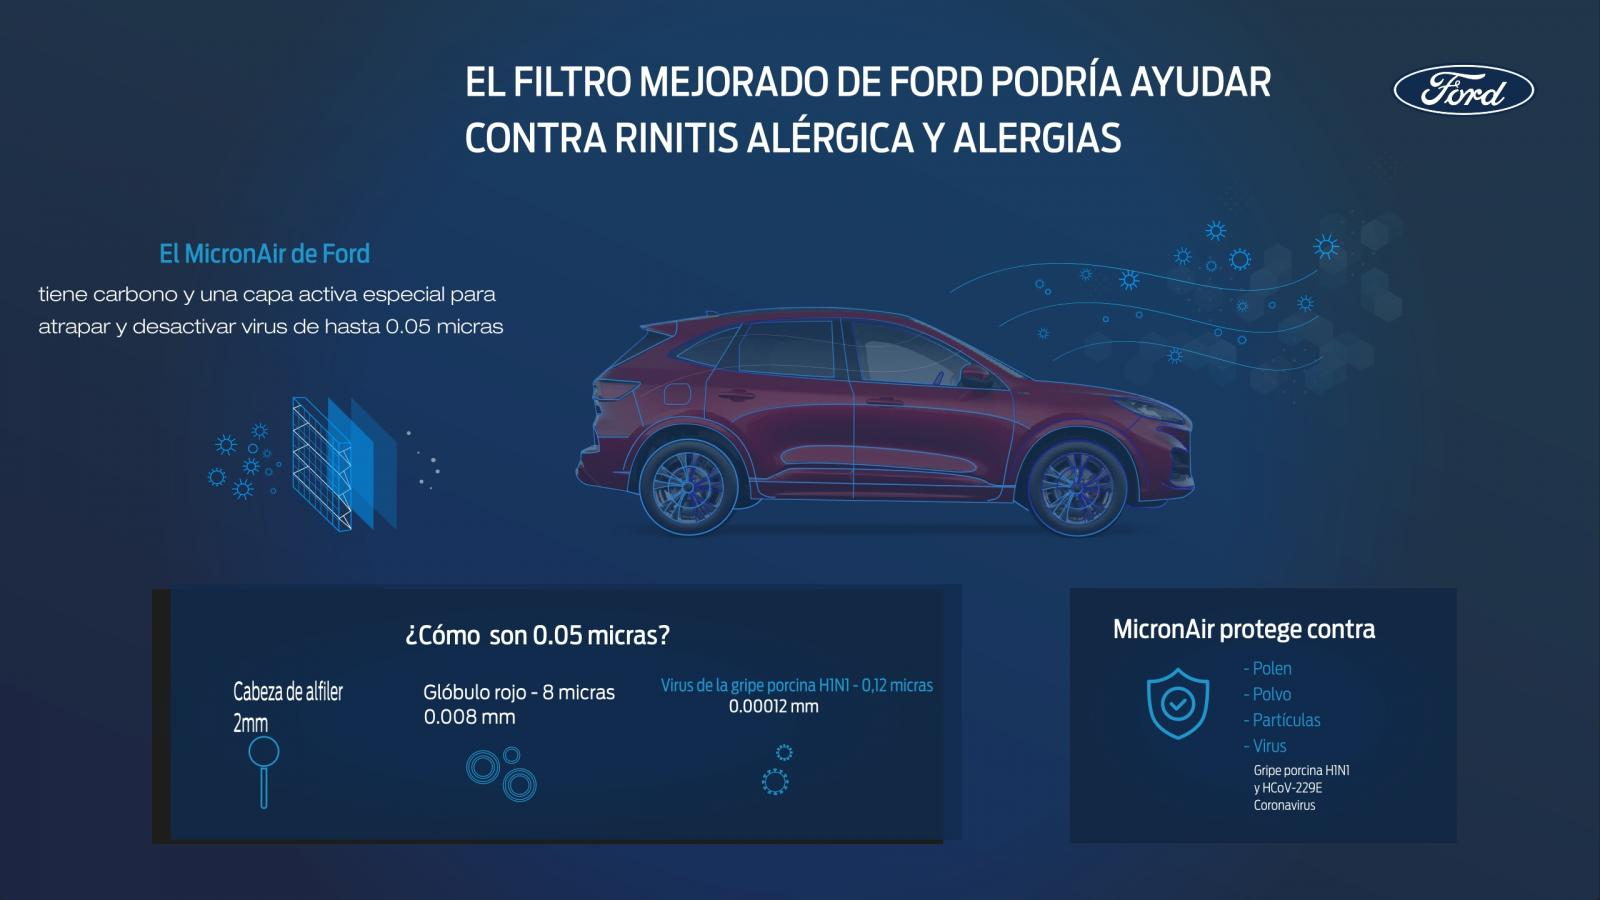 ford-filtros-de-aire